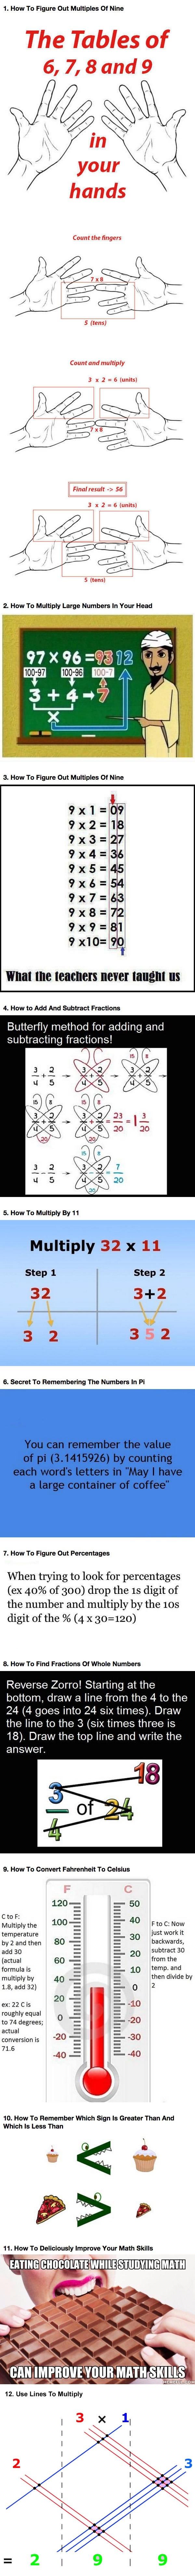 Simple math tricks